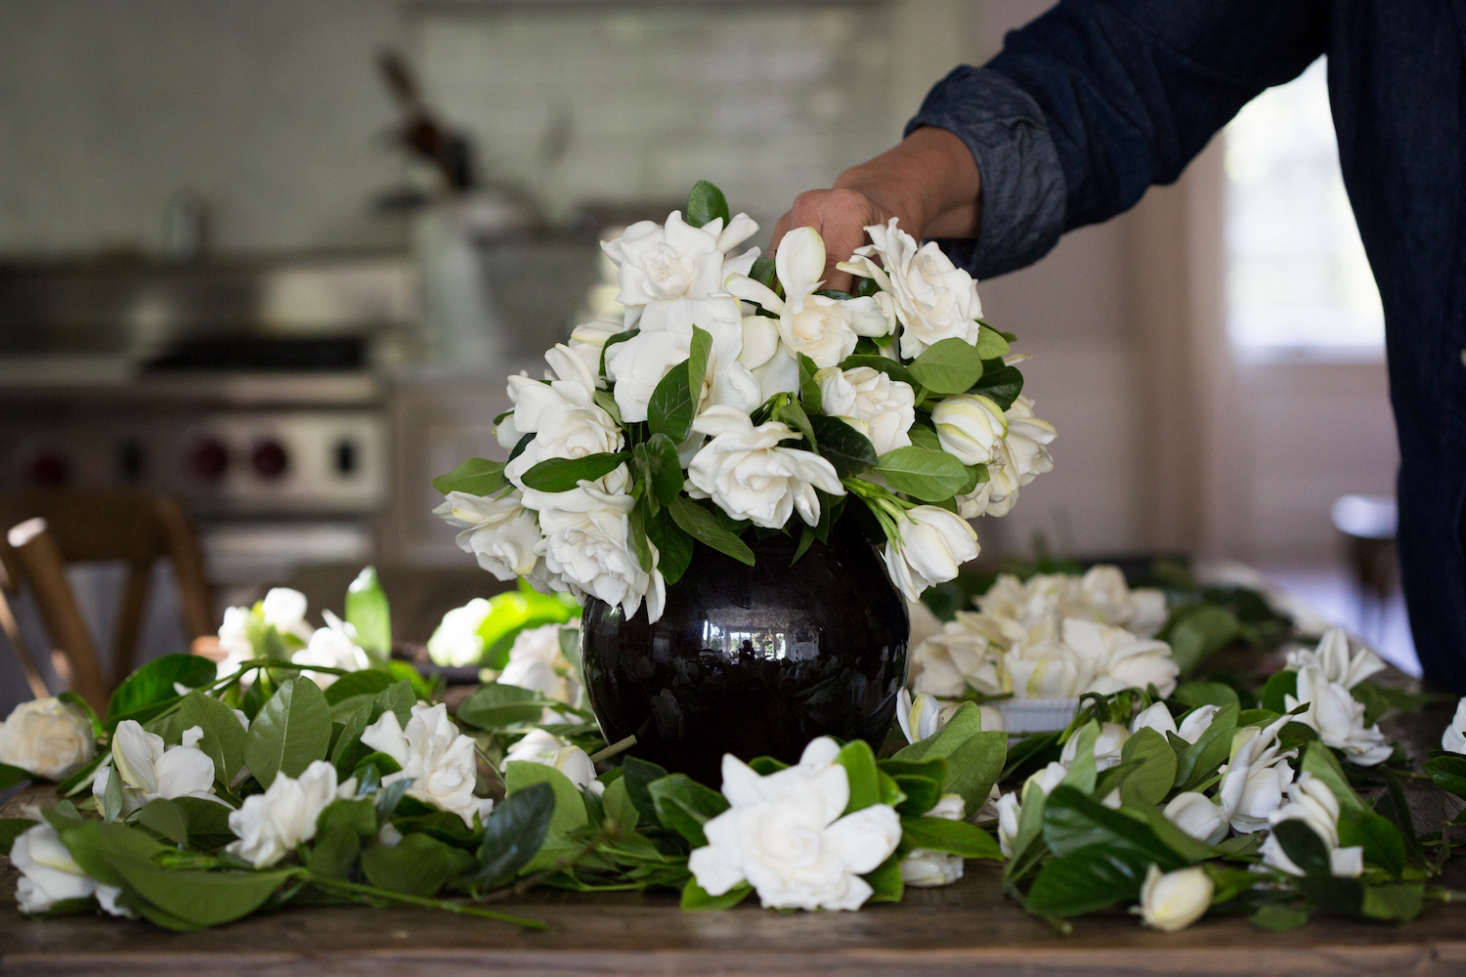 Mothers Day Her Favorite Flowers Delivered To The Door Gardenista